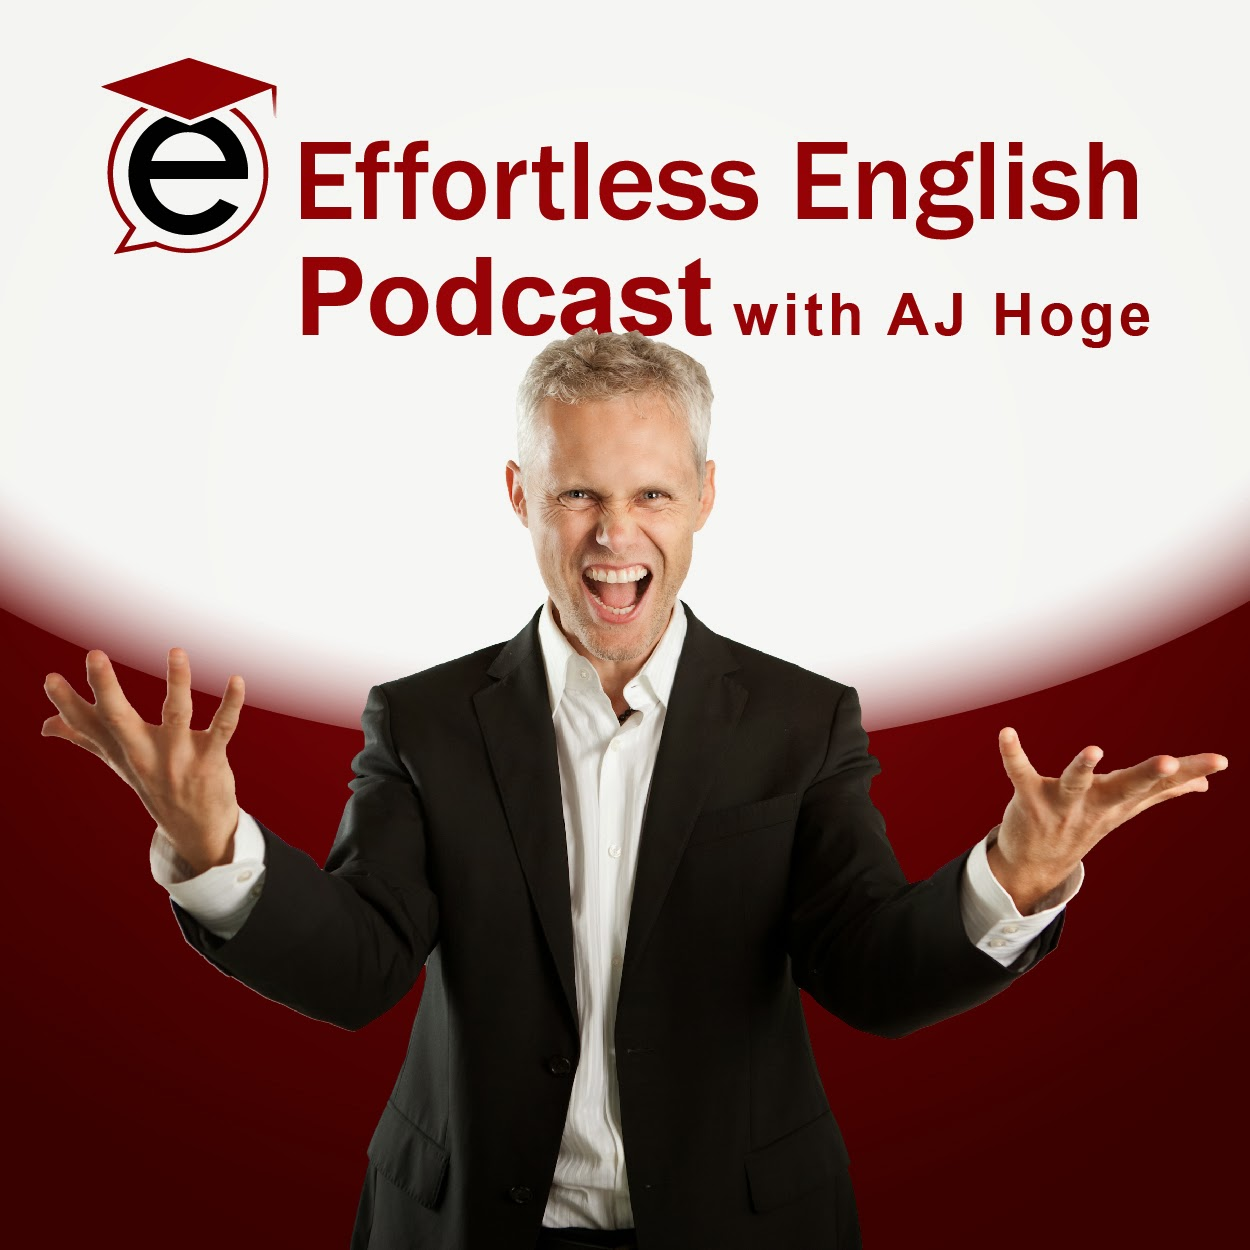 Effortless English Podcast